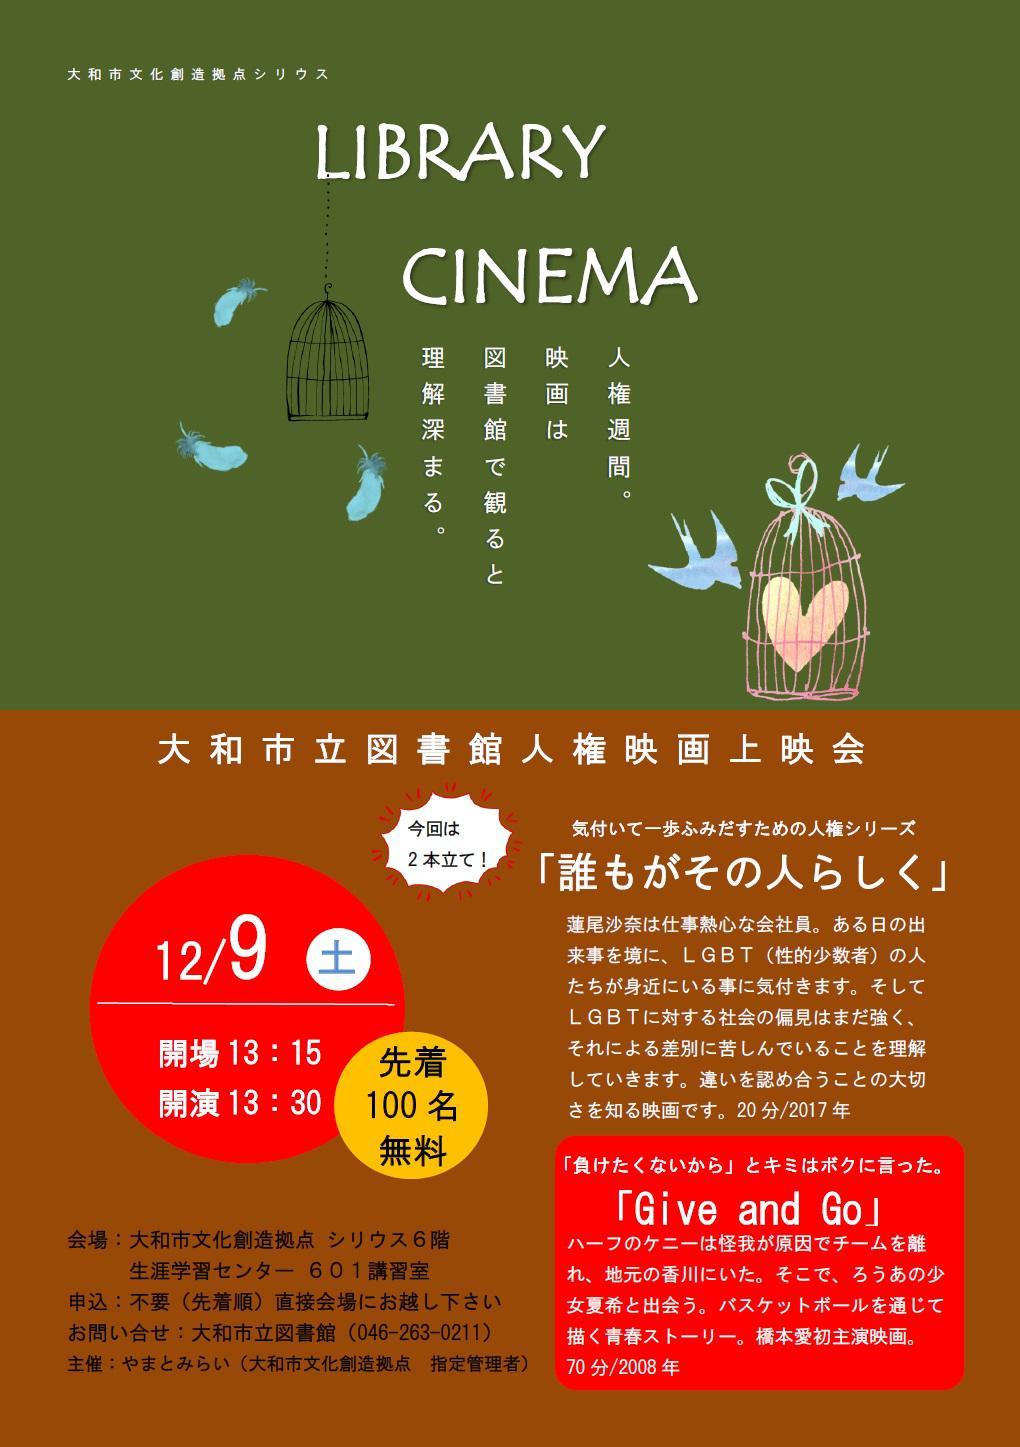 LIBRARY CINEMA大和市立図書館人権映画上映会